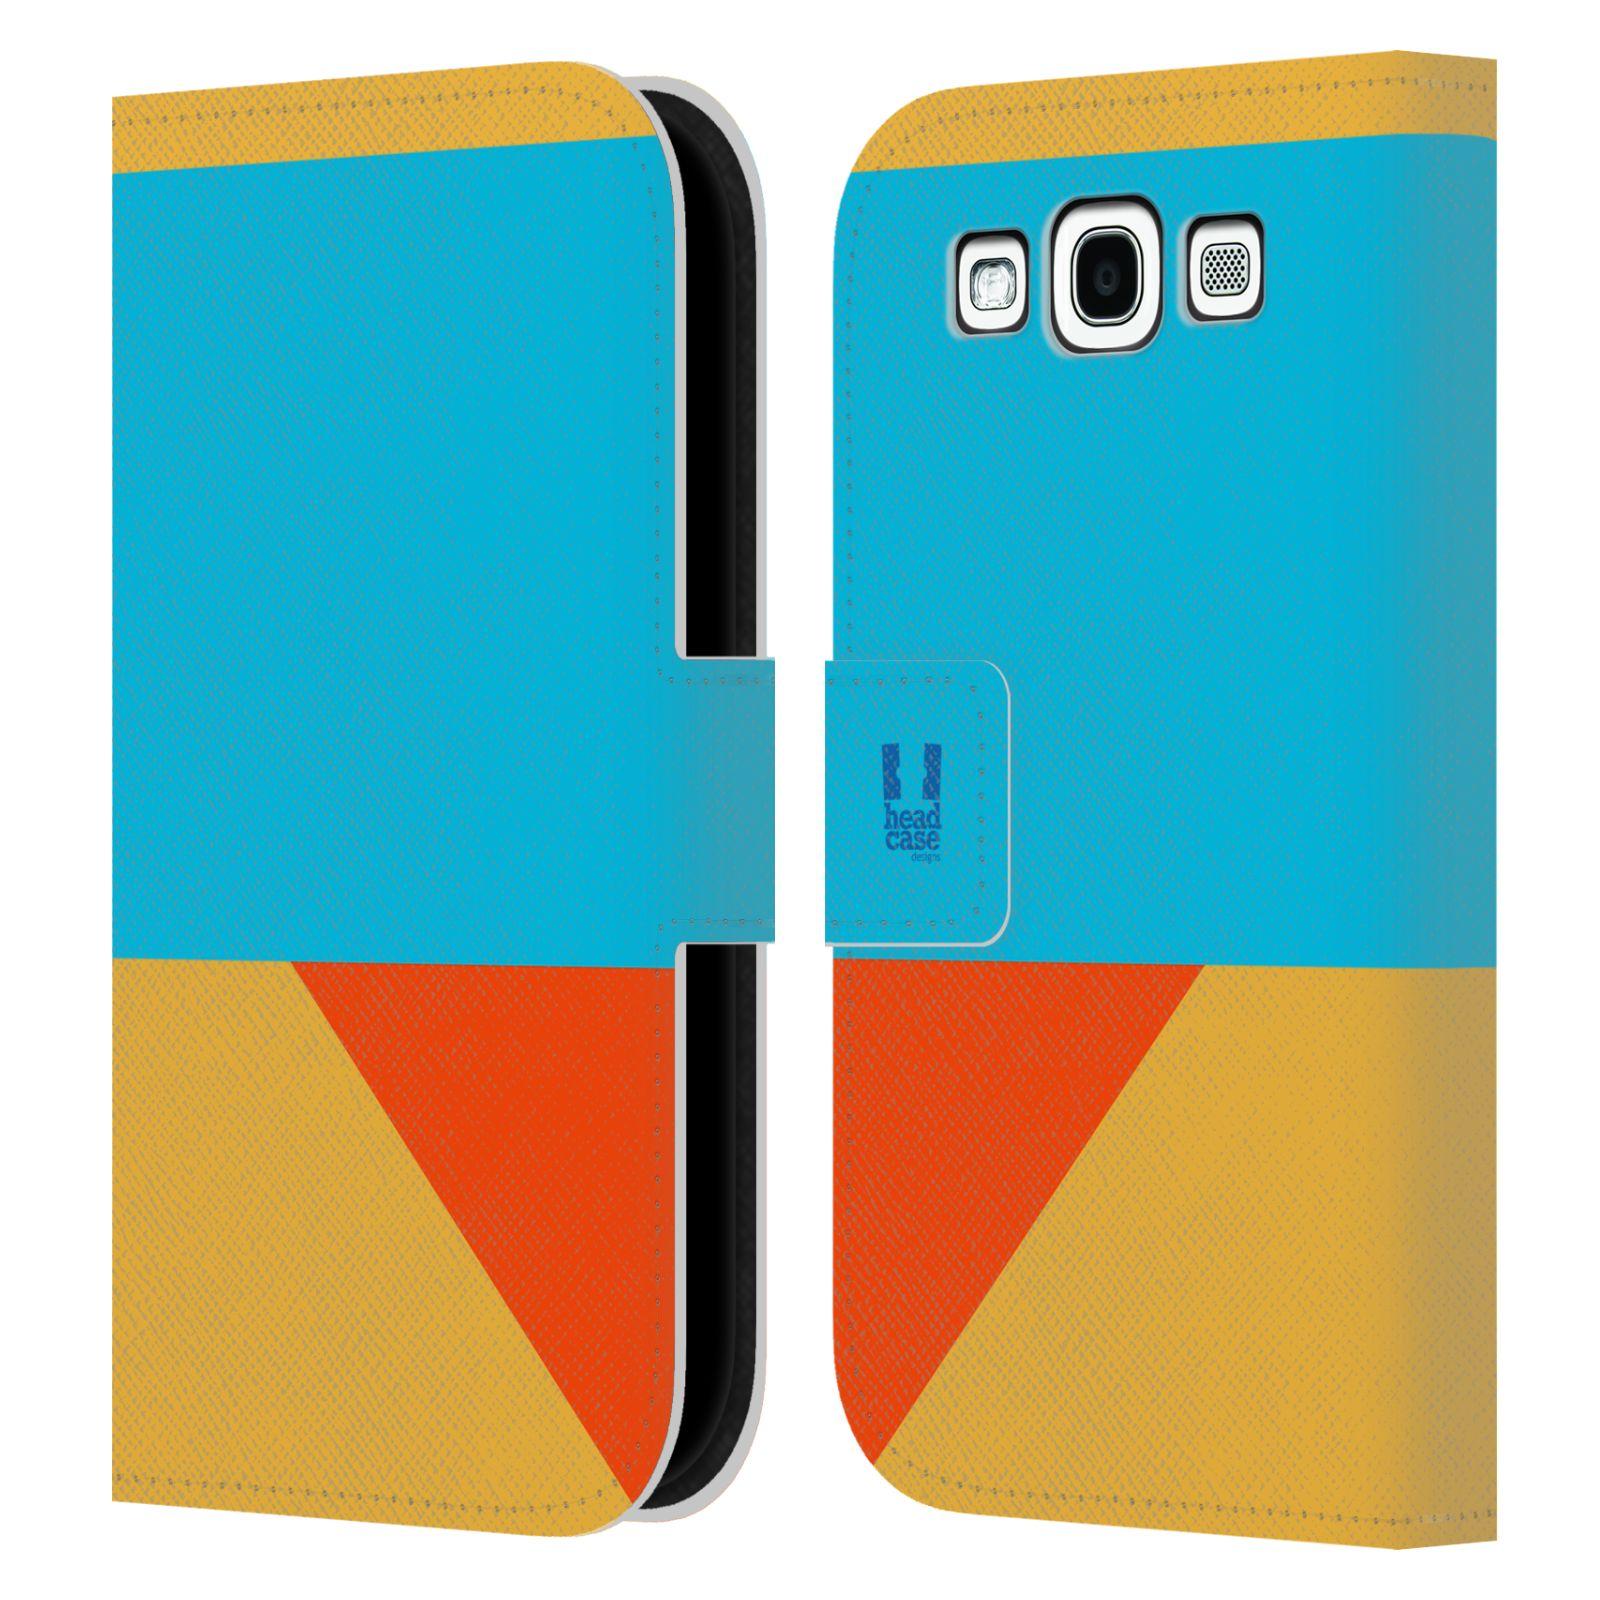 HEAD CASE Flipové pouzdro pro mobil Samsung Galaxy S3 I9300 barevné tvary béžová a modrá DAY WEAR